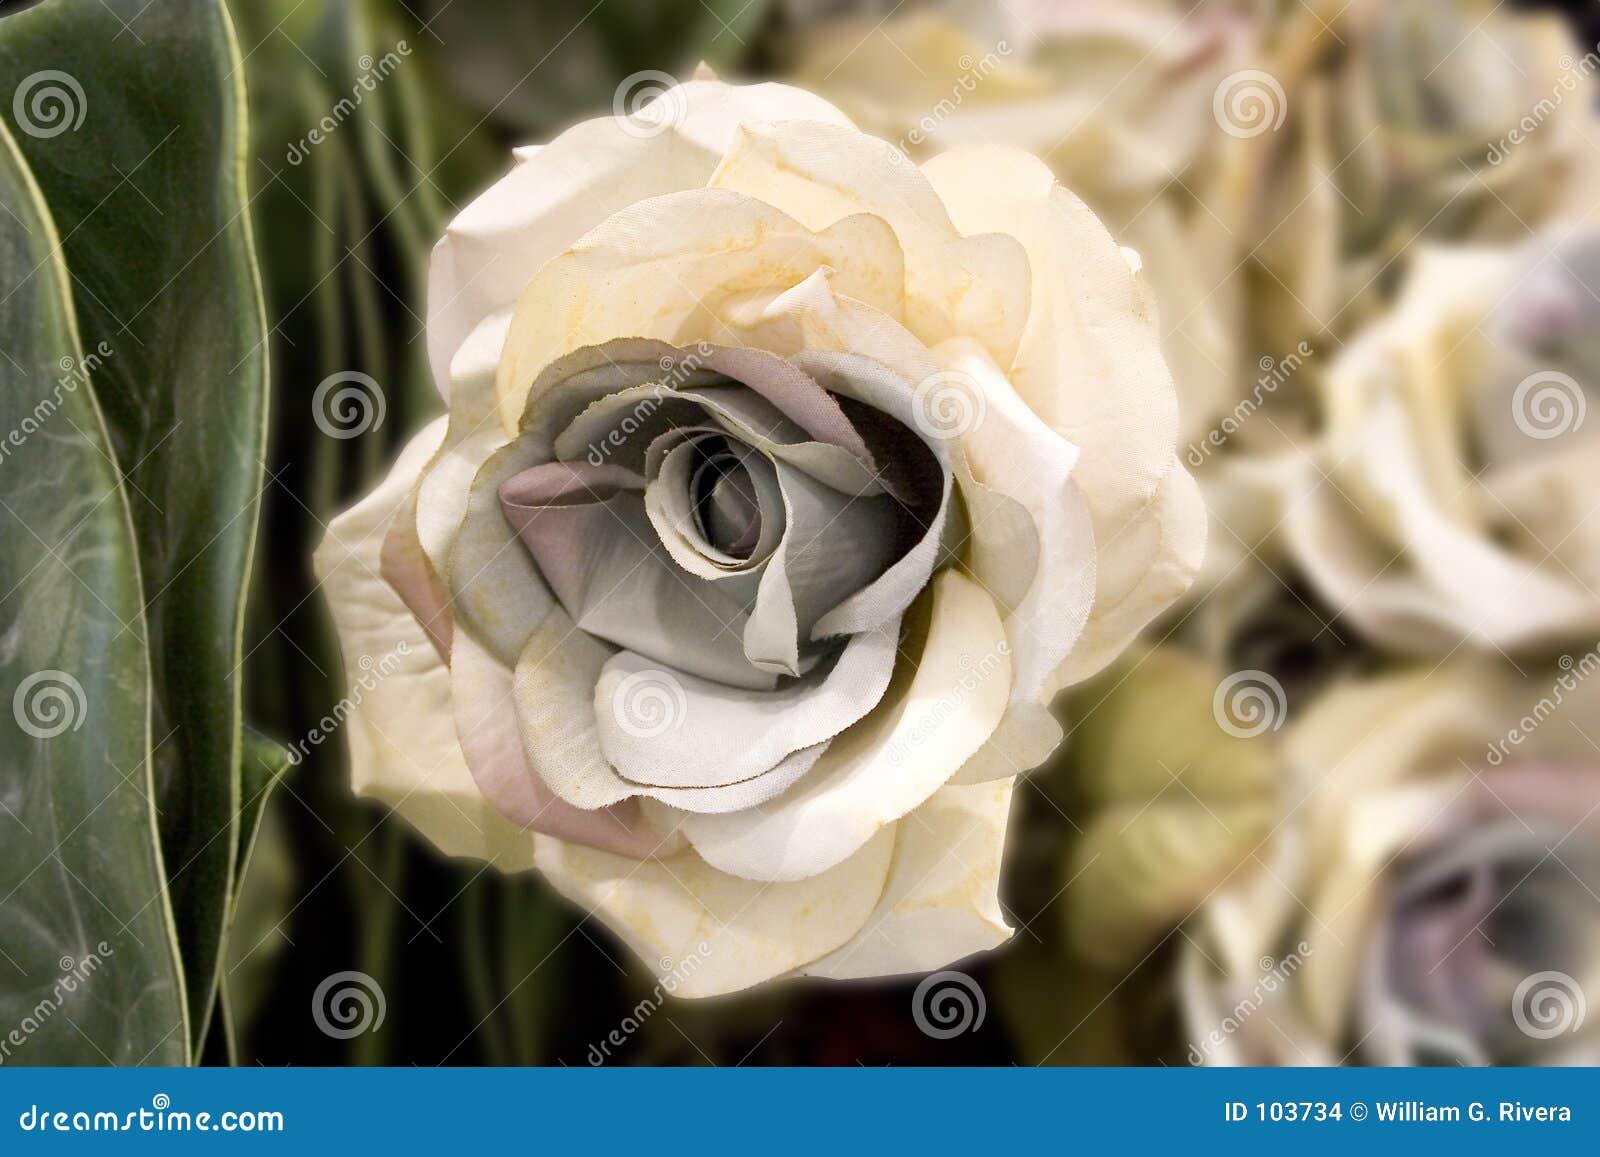 The Fake Pinkish White Flower (Fake Flower Collection)